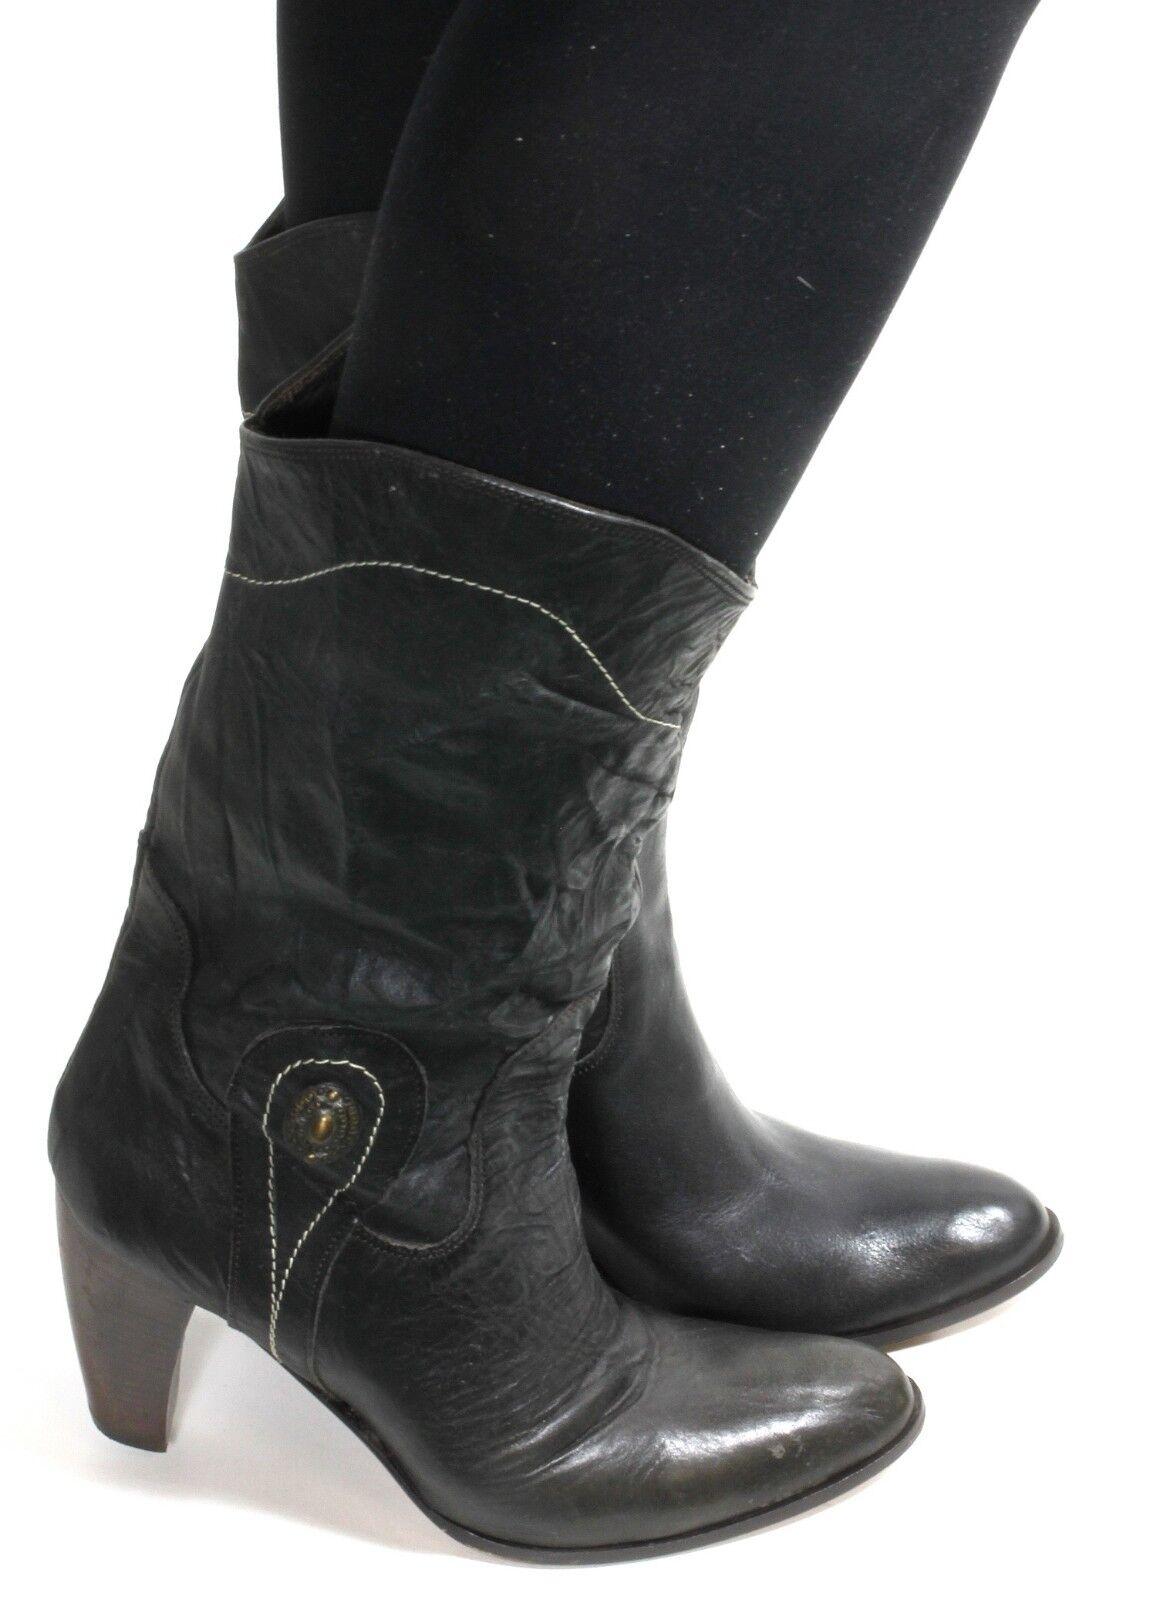 Damenstiefel Vintage Stiefel Blogger High Heels Westernstiefel Cowboy Emblem 38